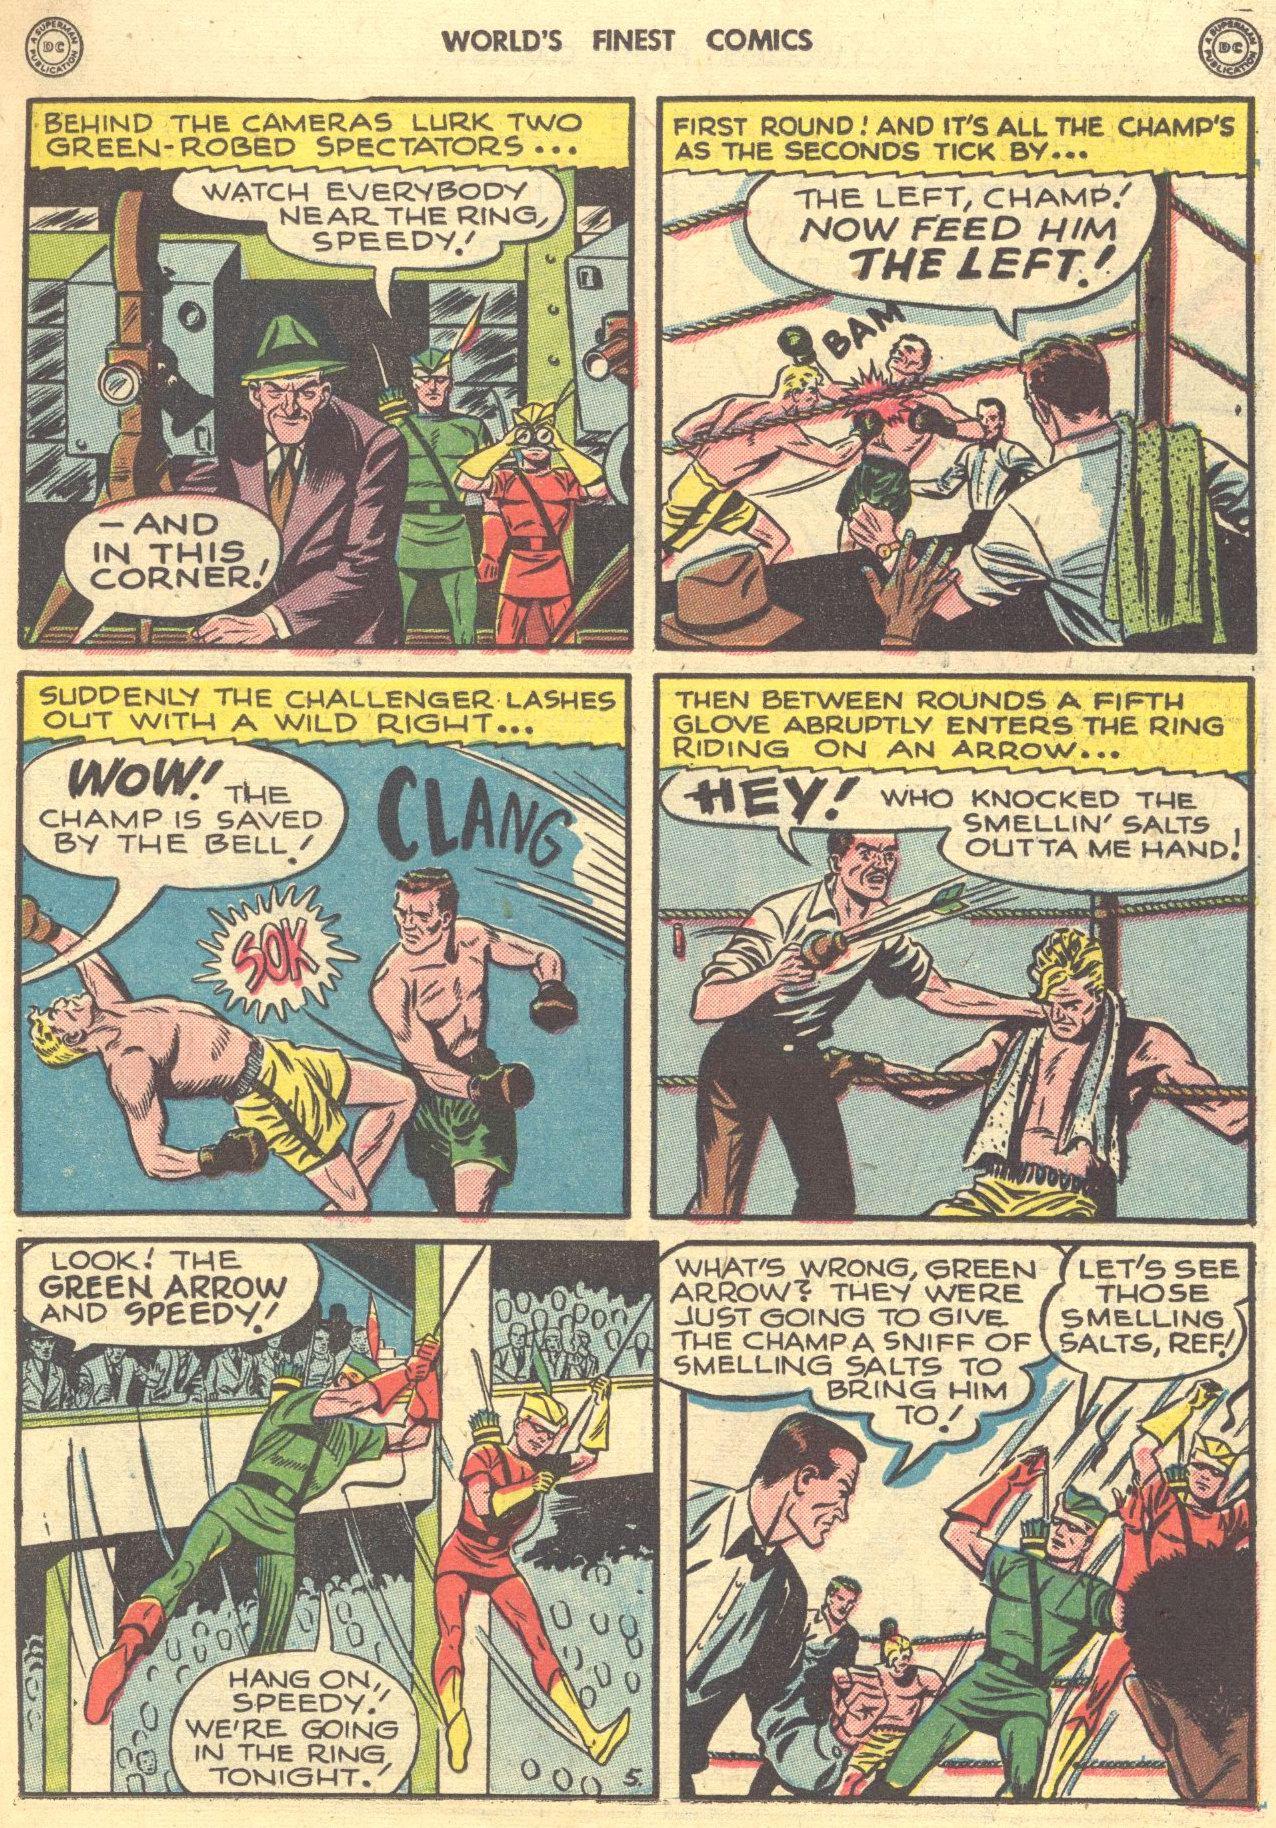 Read online World's Finest Comics comic -  Issue #28 - 20